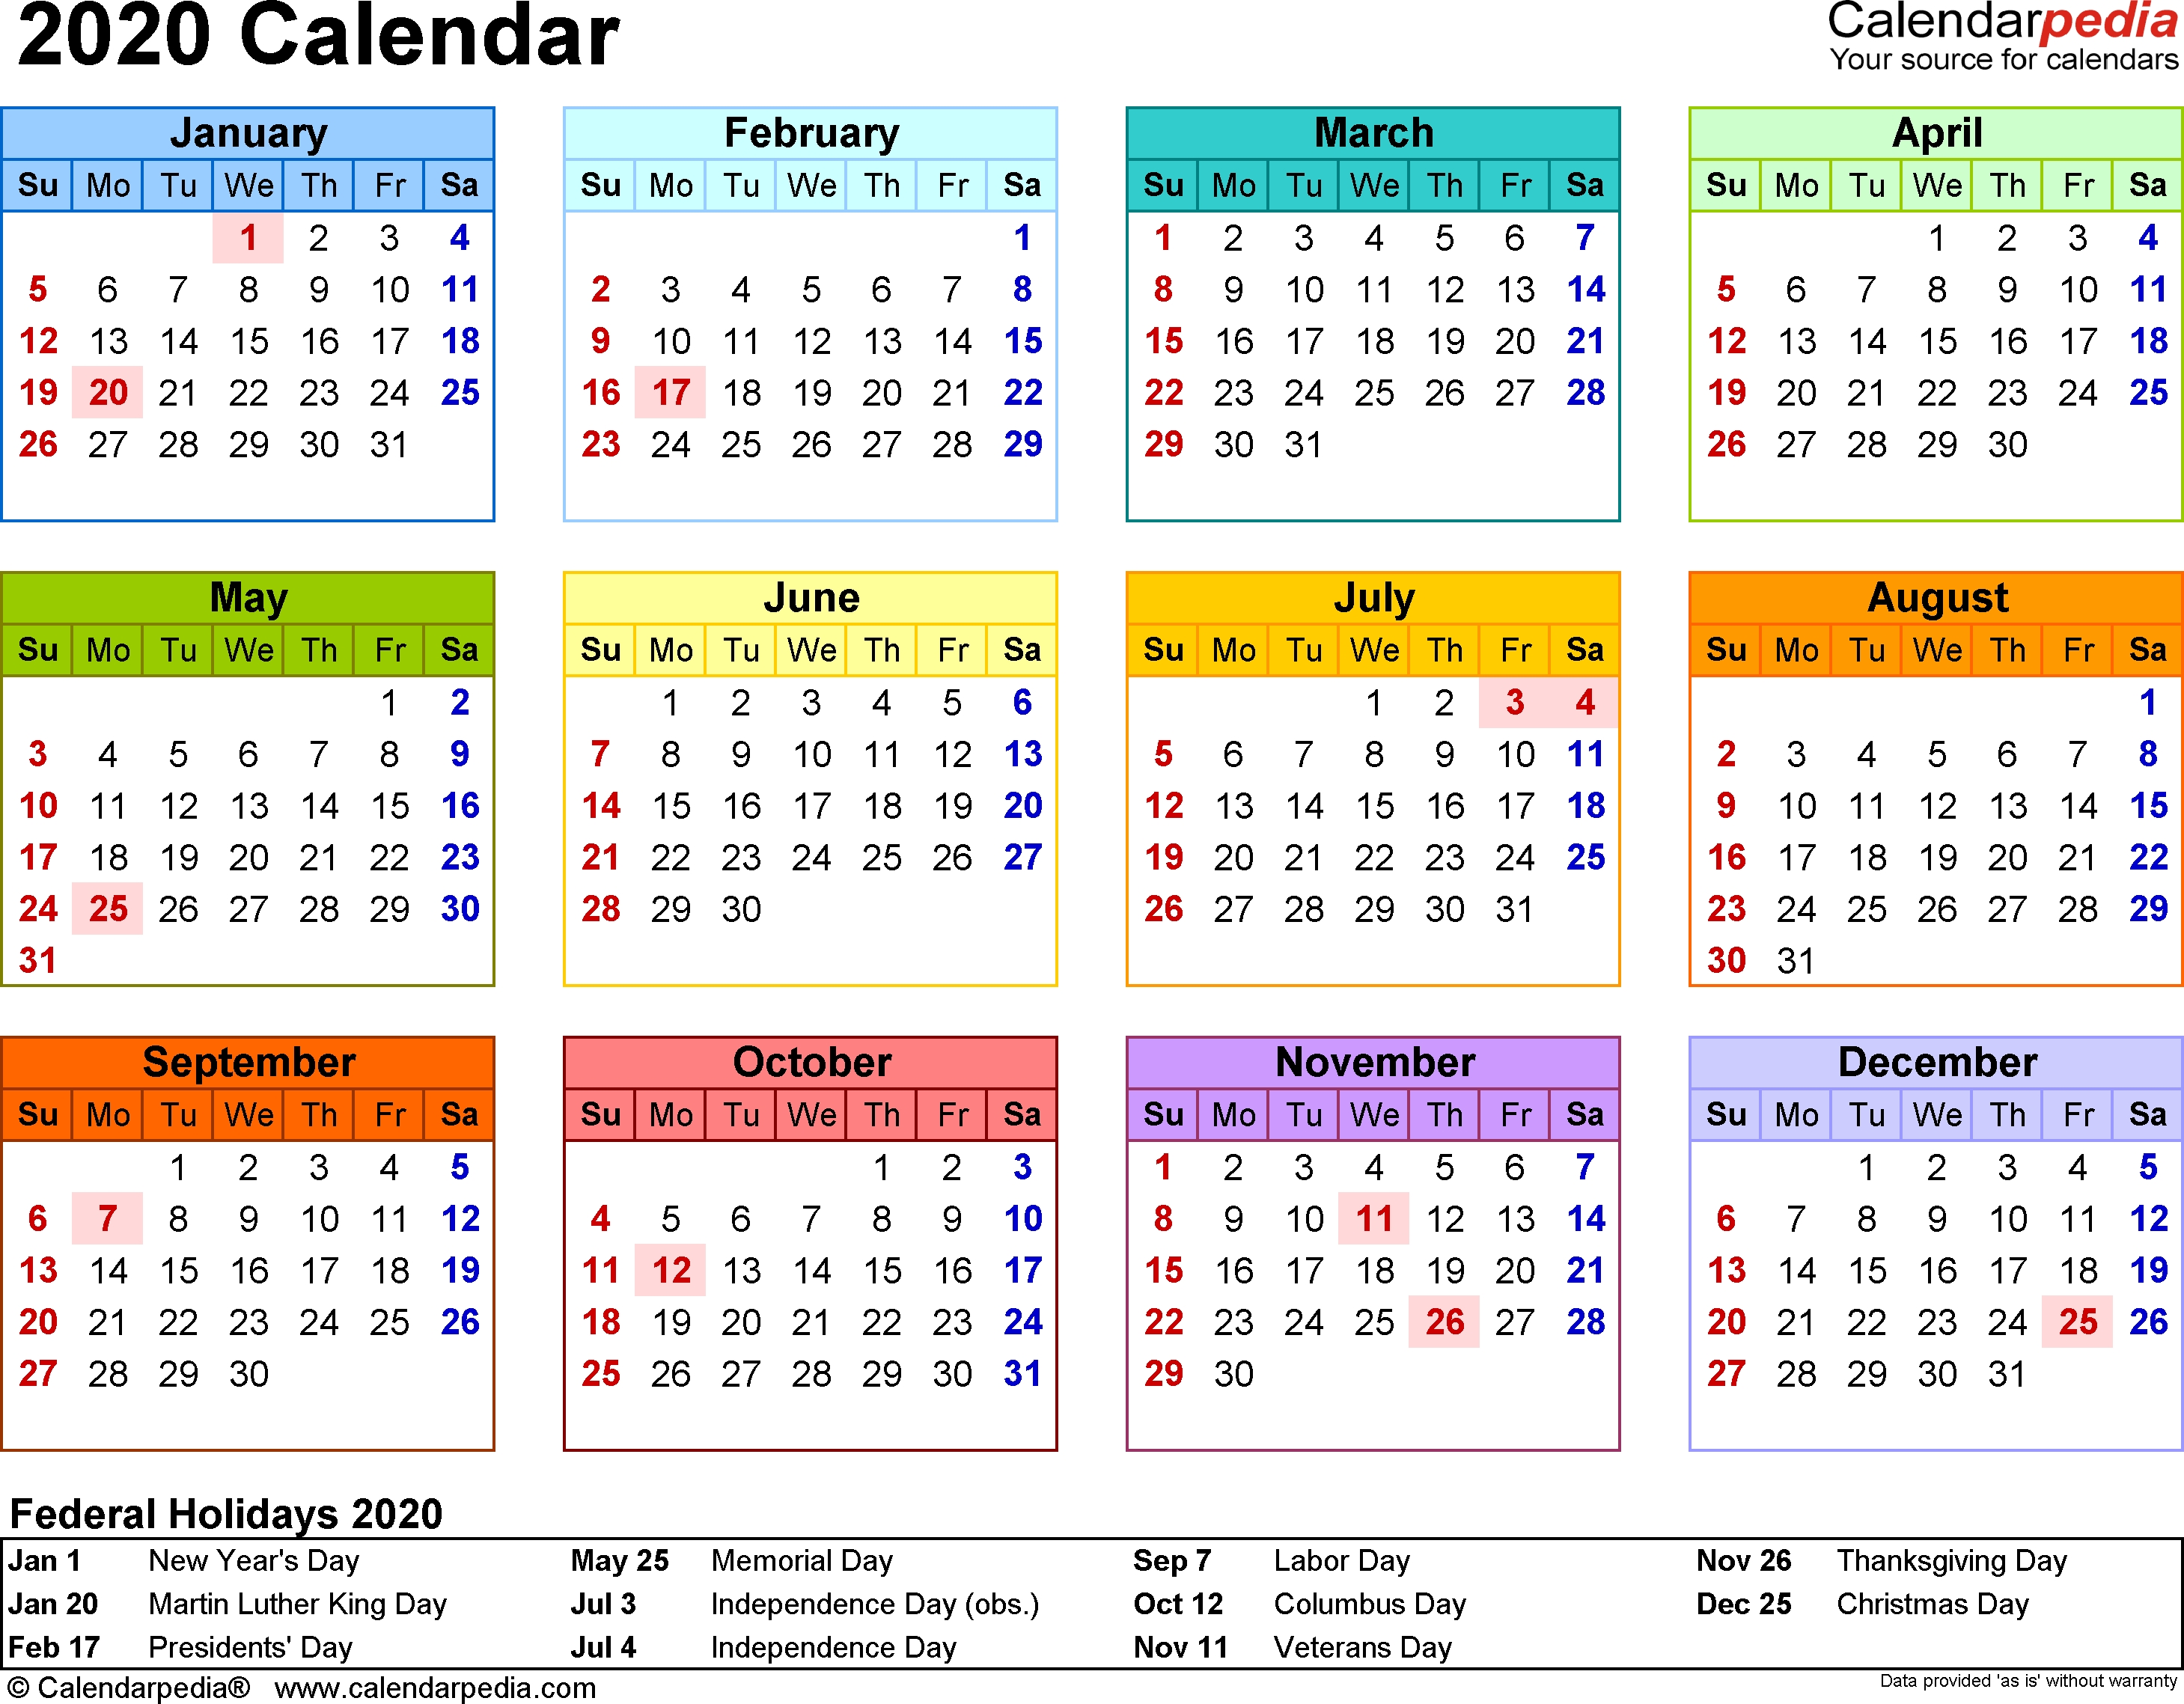 2020 Calendar - 18 Free Printable Word Calendar Templates-2 Page Monthly Calendar Printable 2020